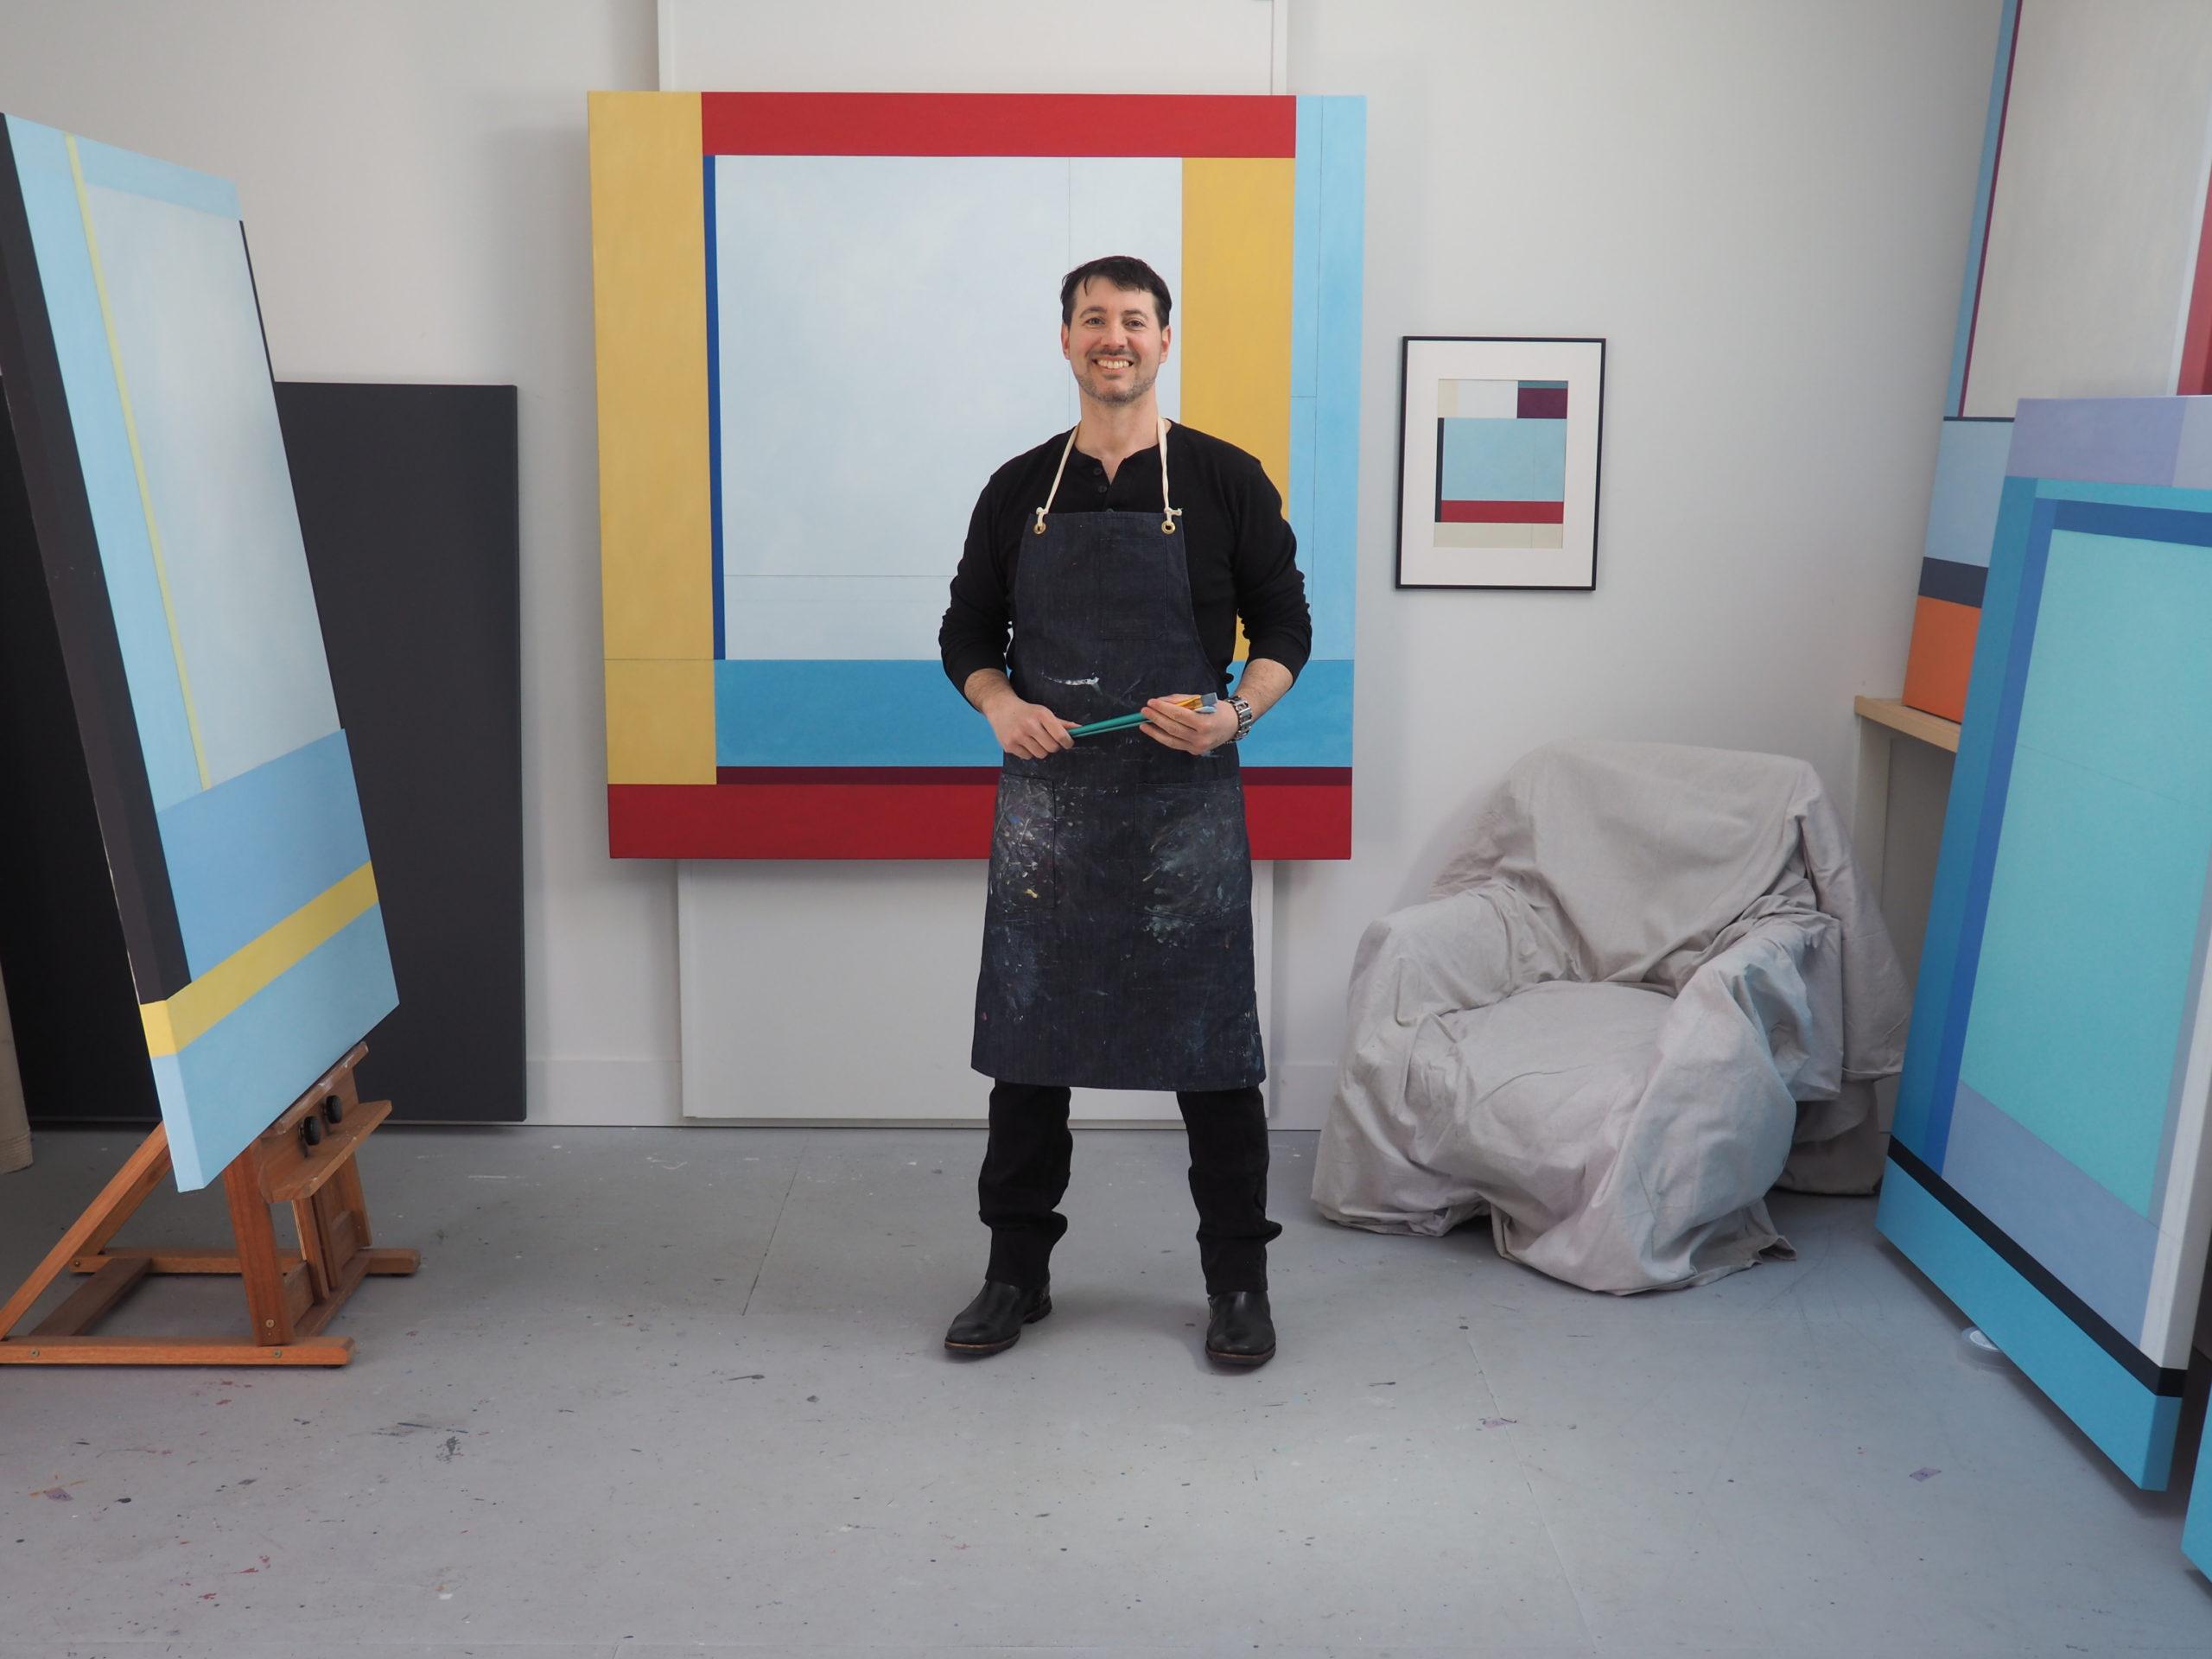 Artist Chris Kelly at work in the studio.